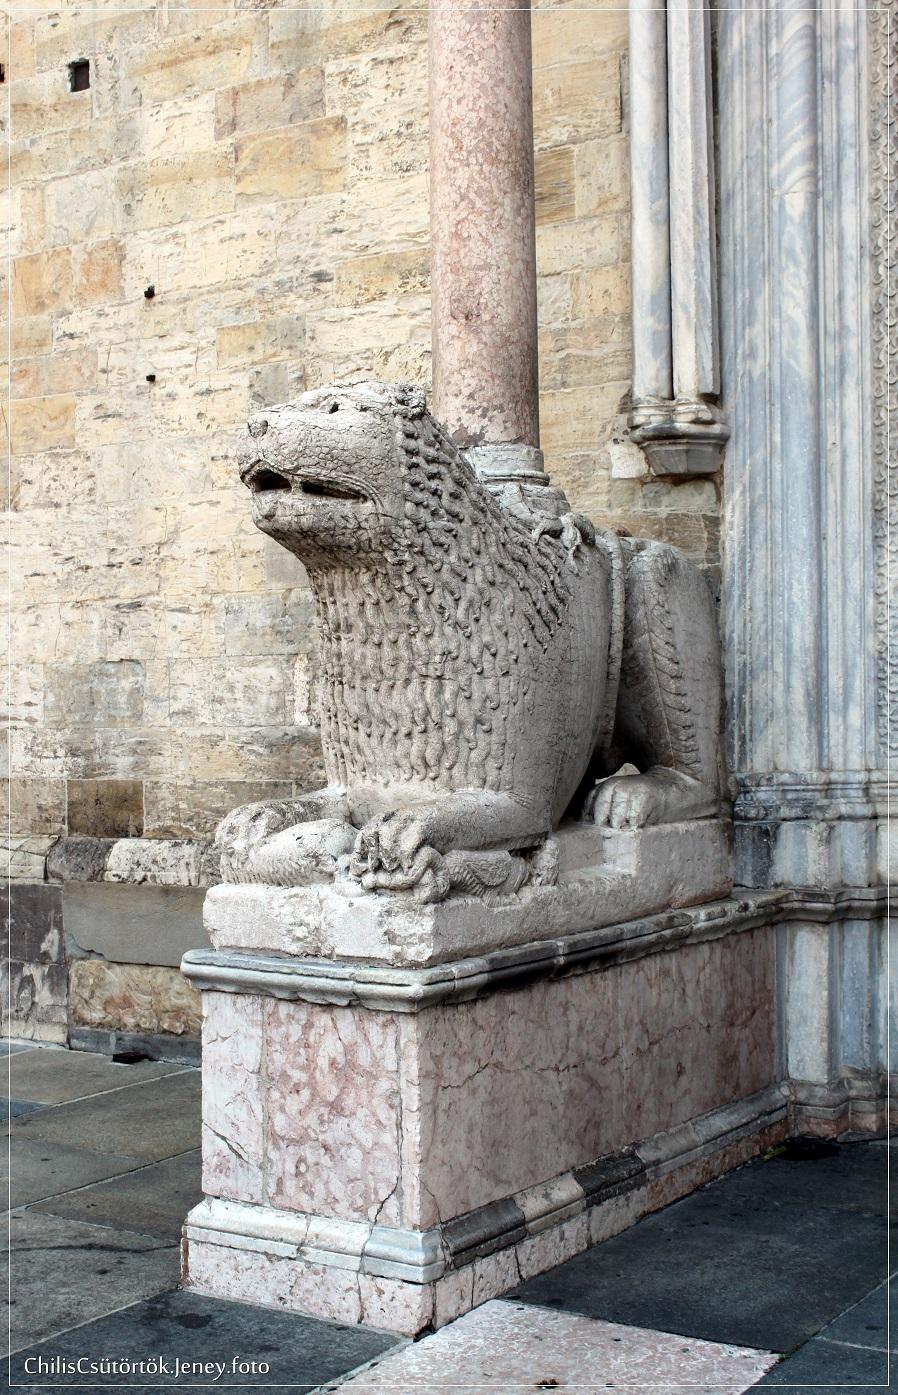 Emilia-Romagnai jellegzetesség